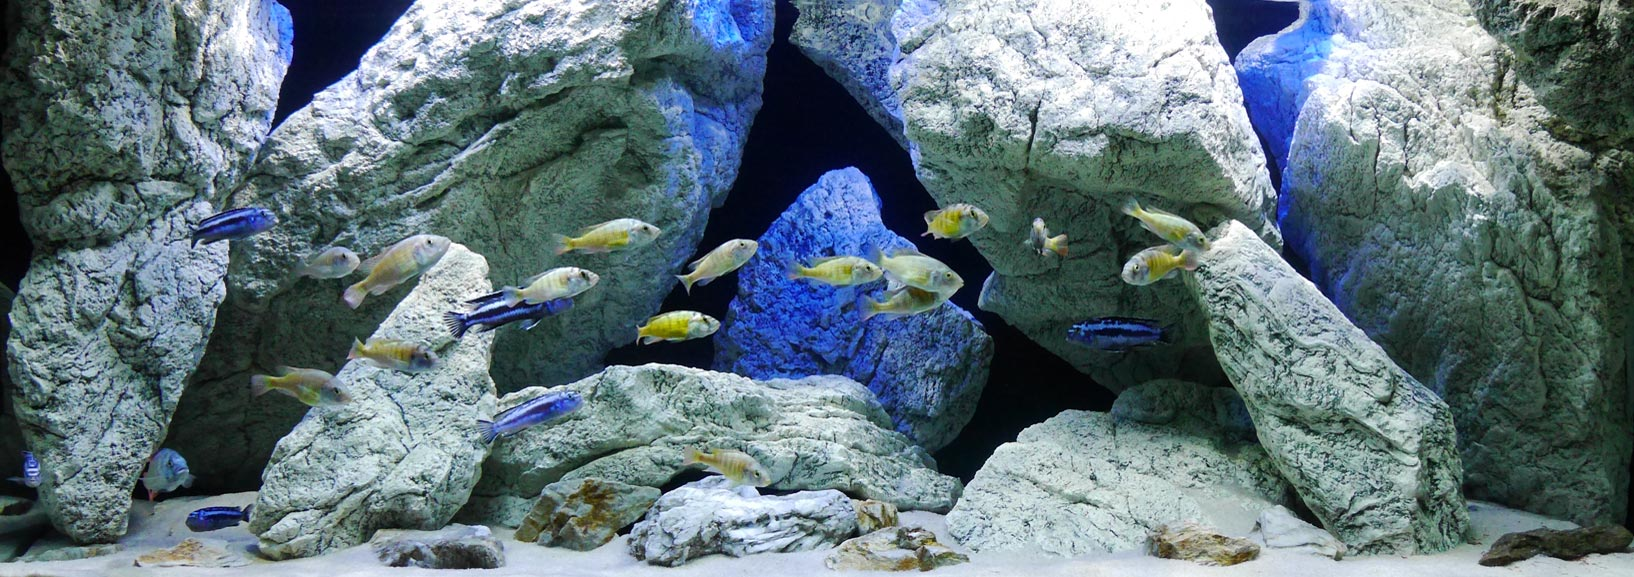 3D Aquarium rotsen en stenen